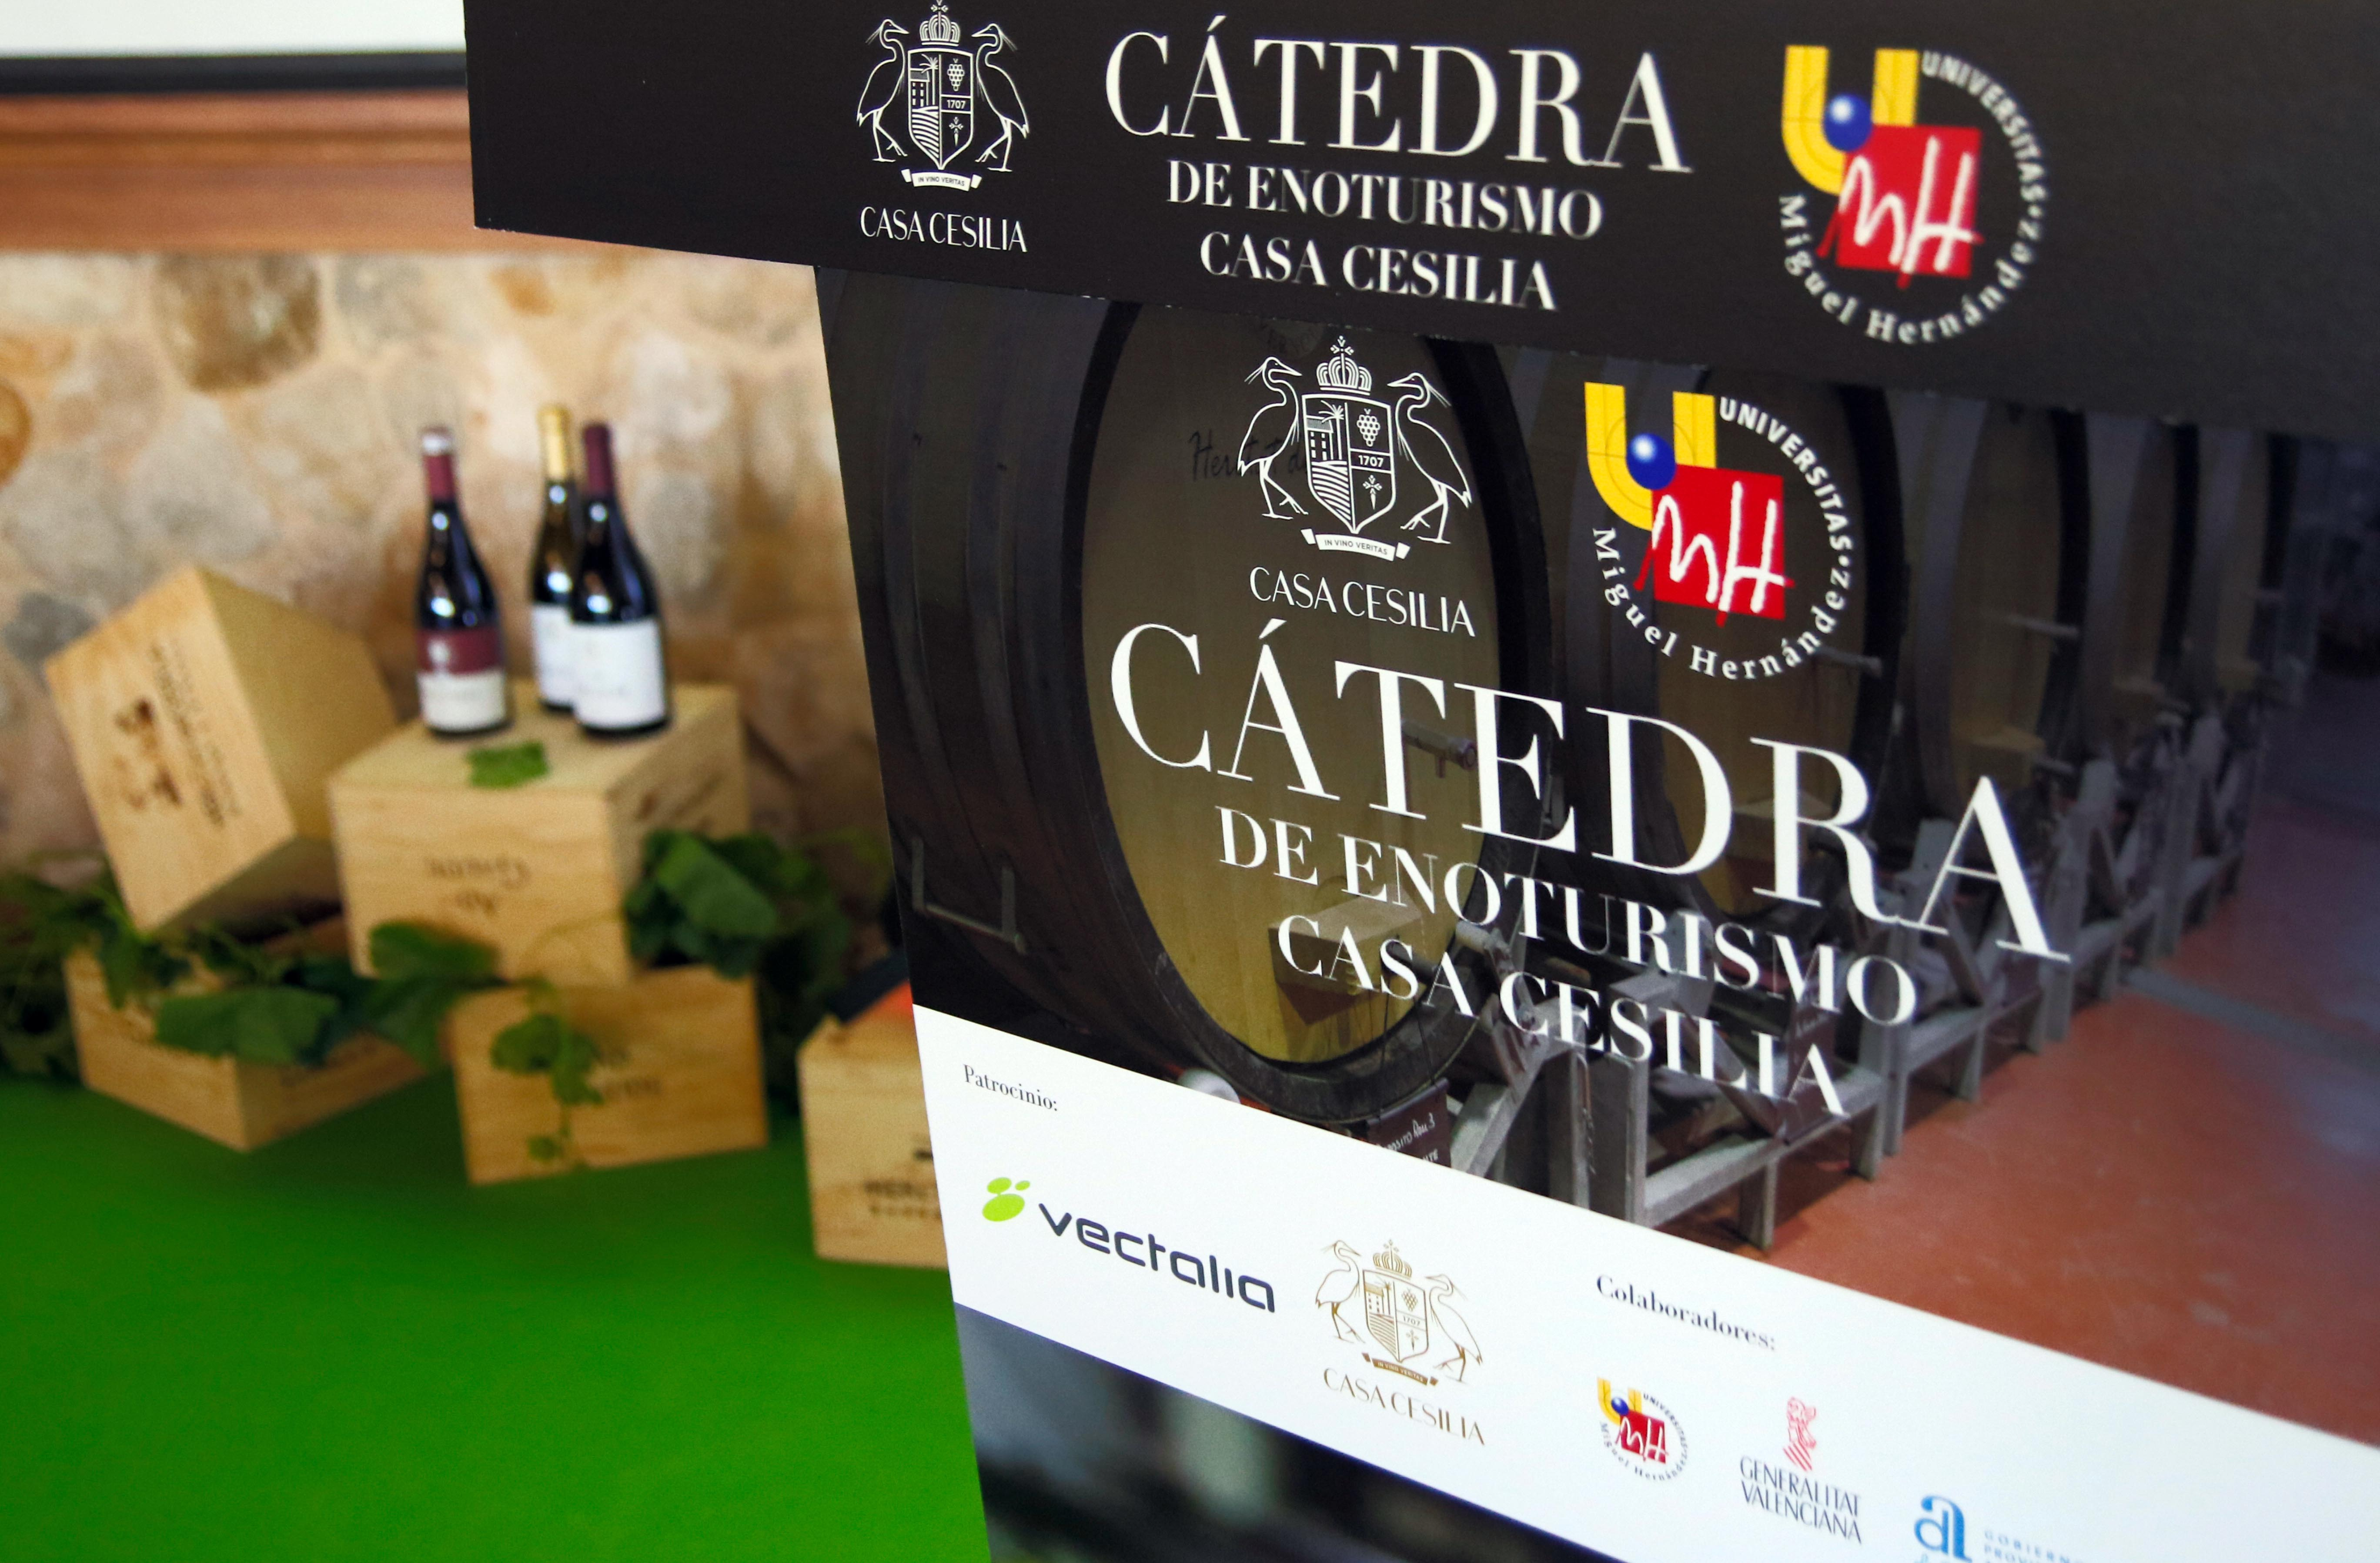 Catedra Casa Cesilia Enoturismo